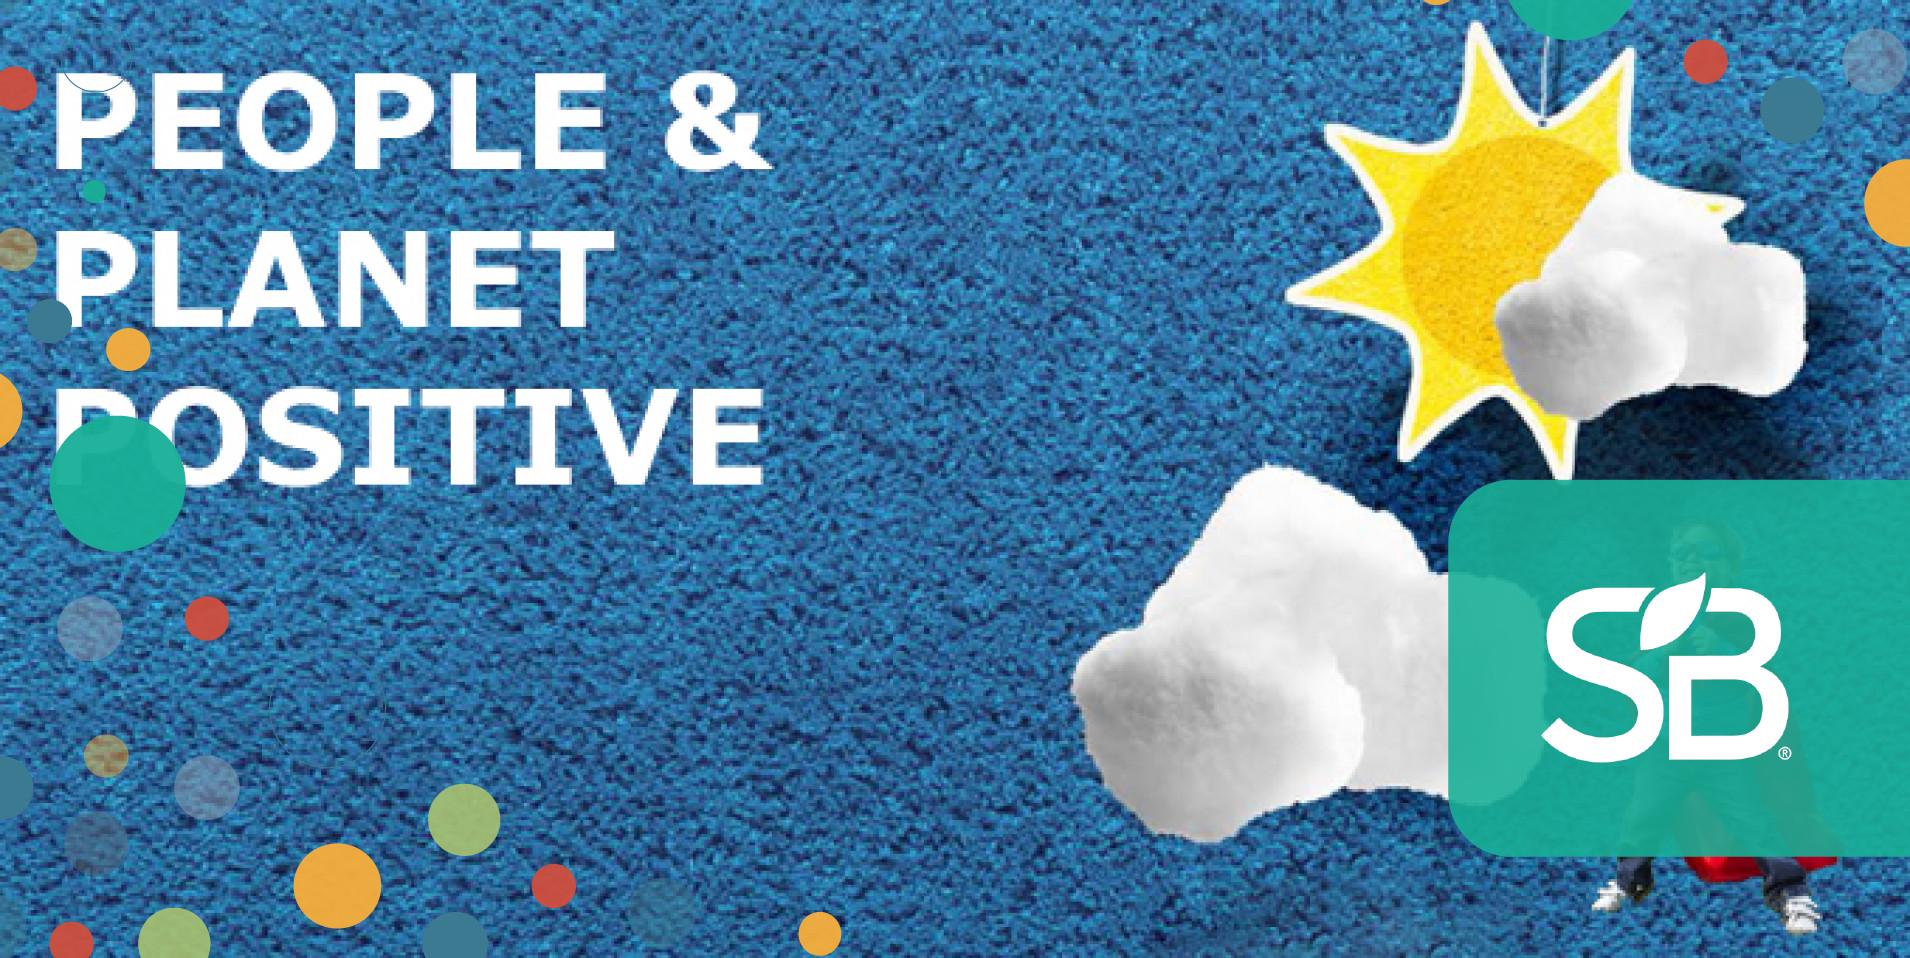 Ikea And Kingfisher Pledge Ambitious Net Positive